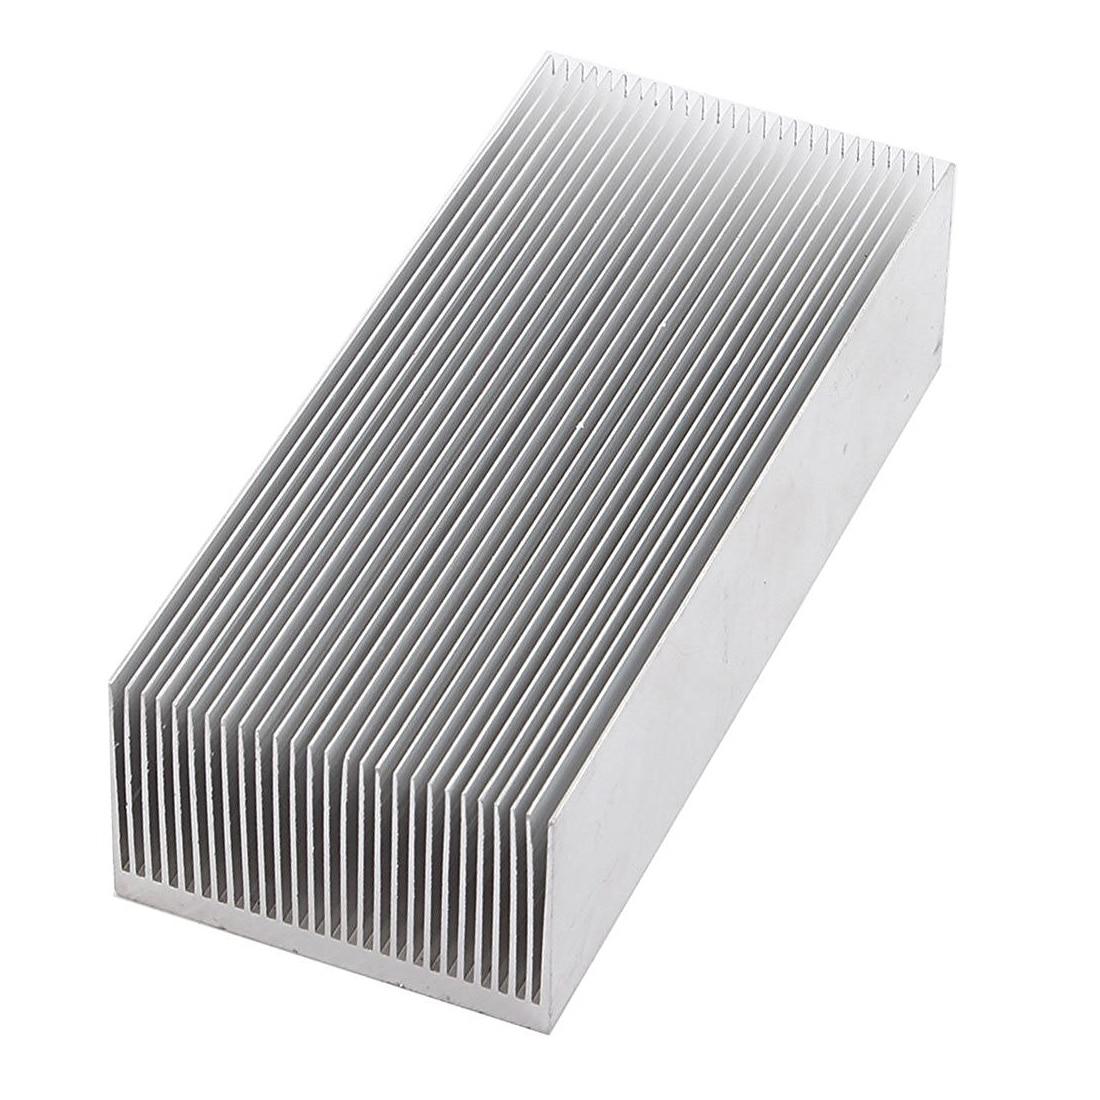 Aluminum Heat Radiator Heatsink Cooling Fin 150x69x37mm Silver Tone 5pcs lot black aluminum fin 28x28x11mm electronic cooling radiator heatsink for cpu gpu graphics video card 1w led dissipator